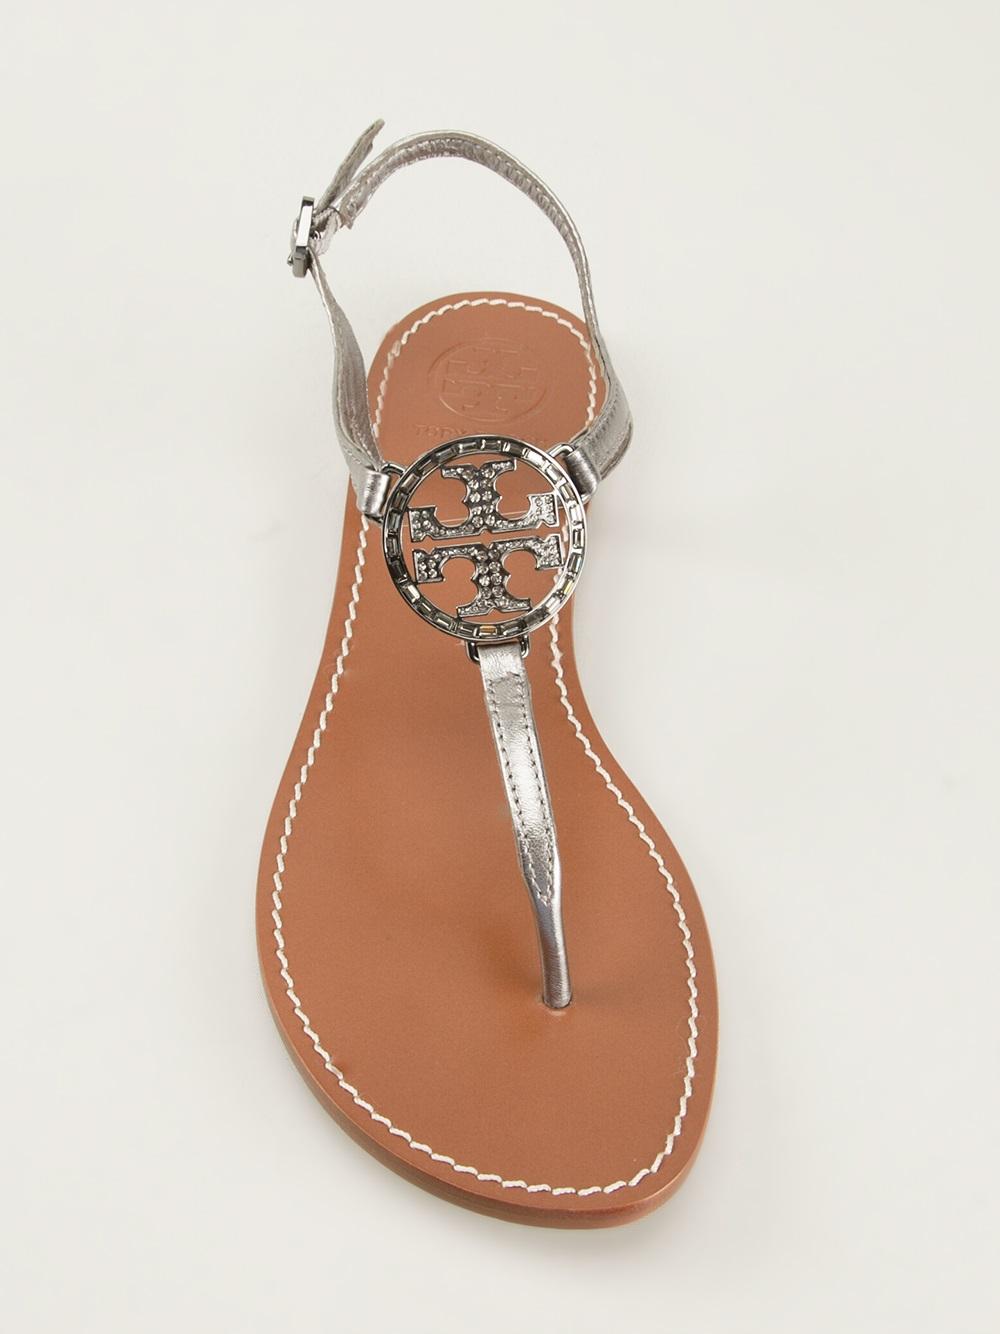 Tory Burch Thong Logo Sandals In Gray Metallic Lyst